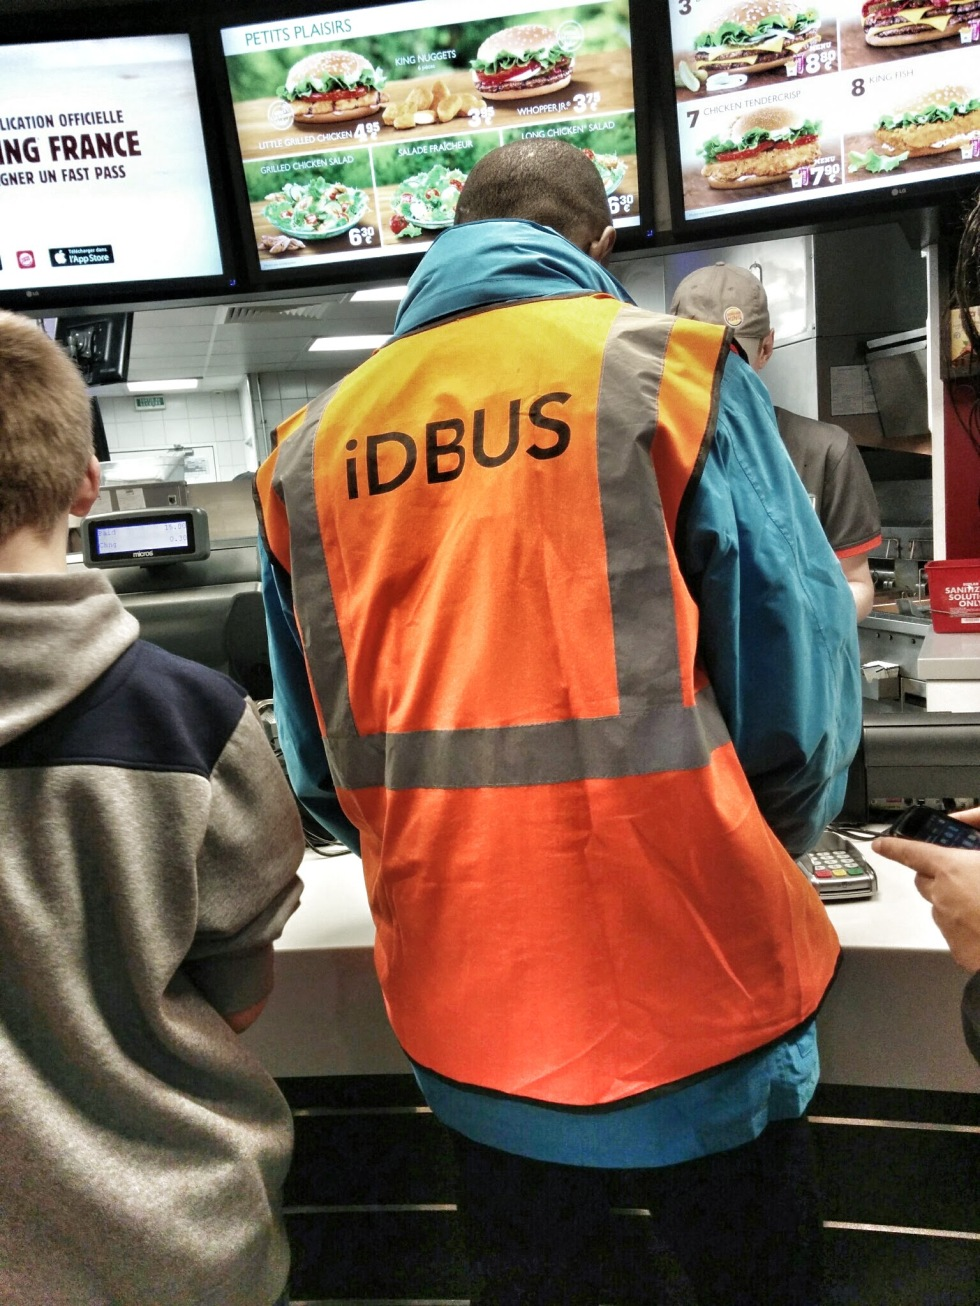 IDBUS aime les burgers